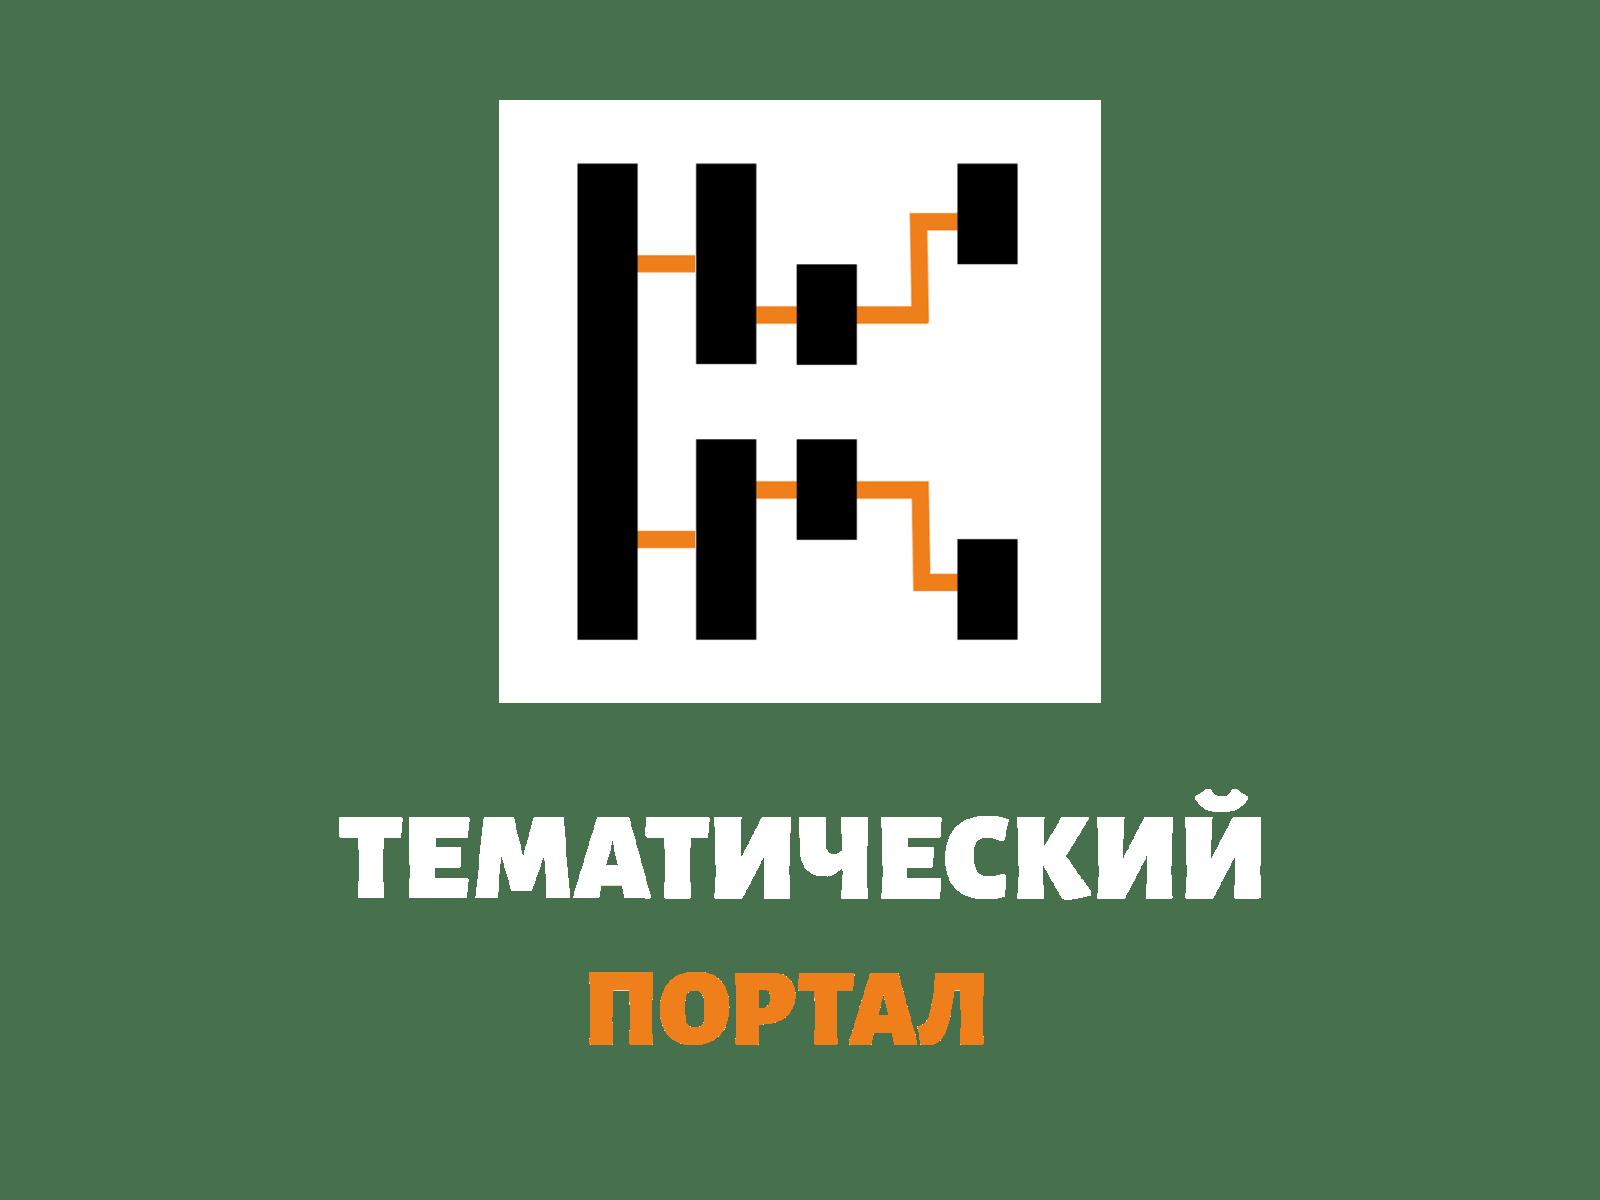 tematicheskij portal - Создание сайтов в Атырау